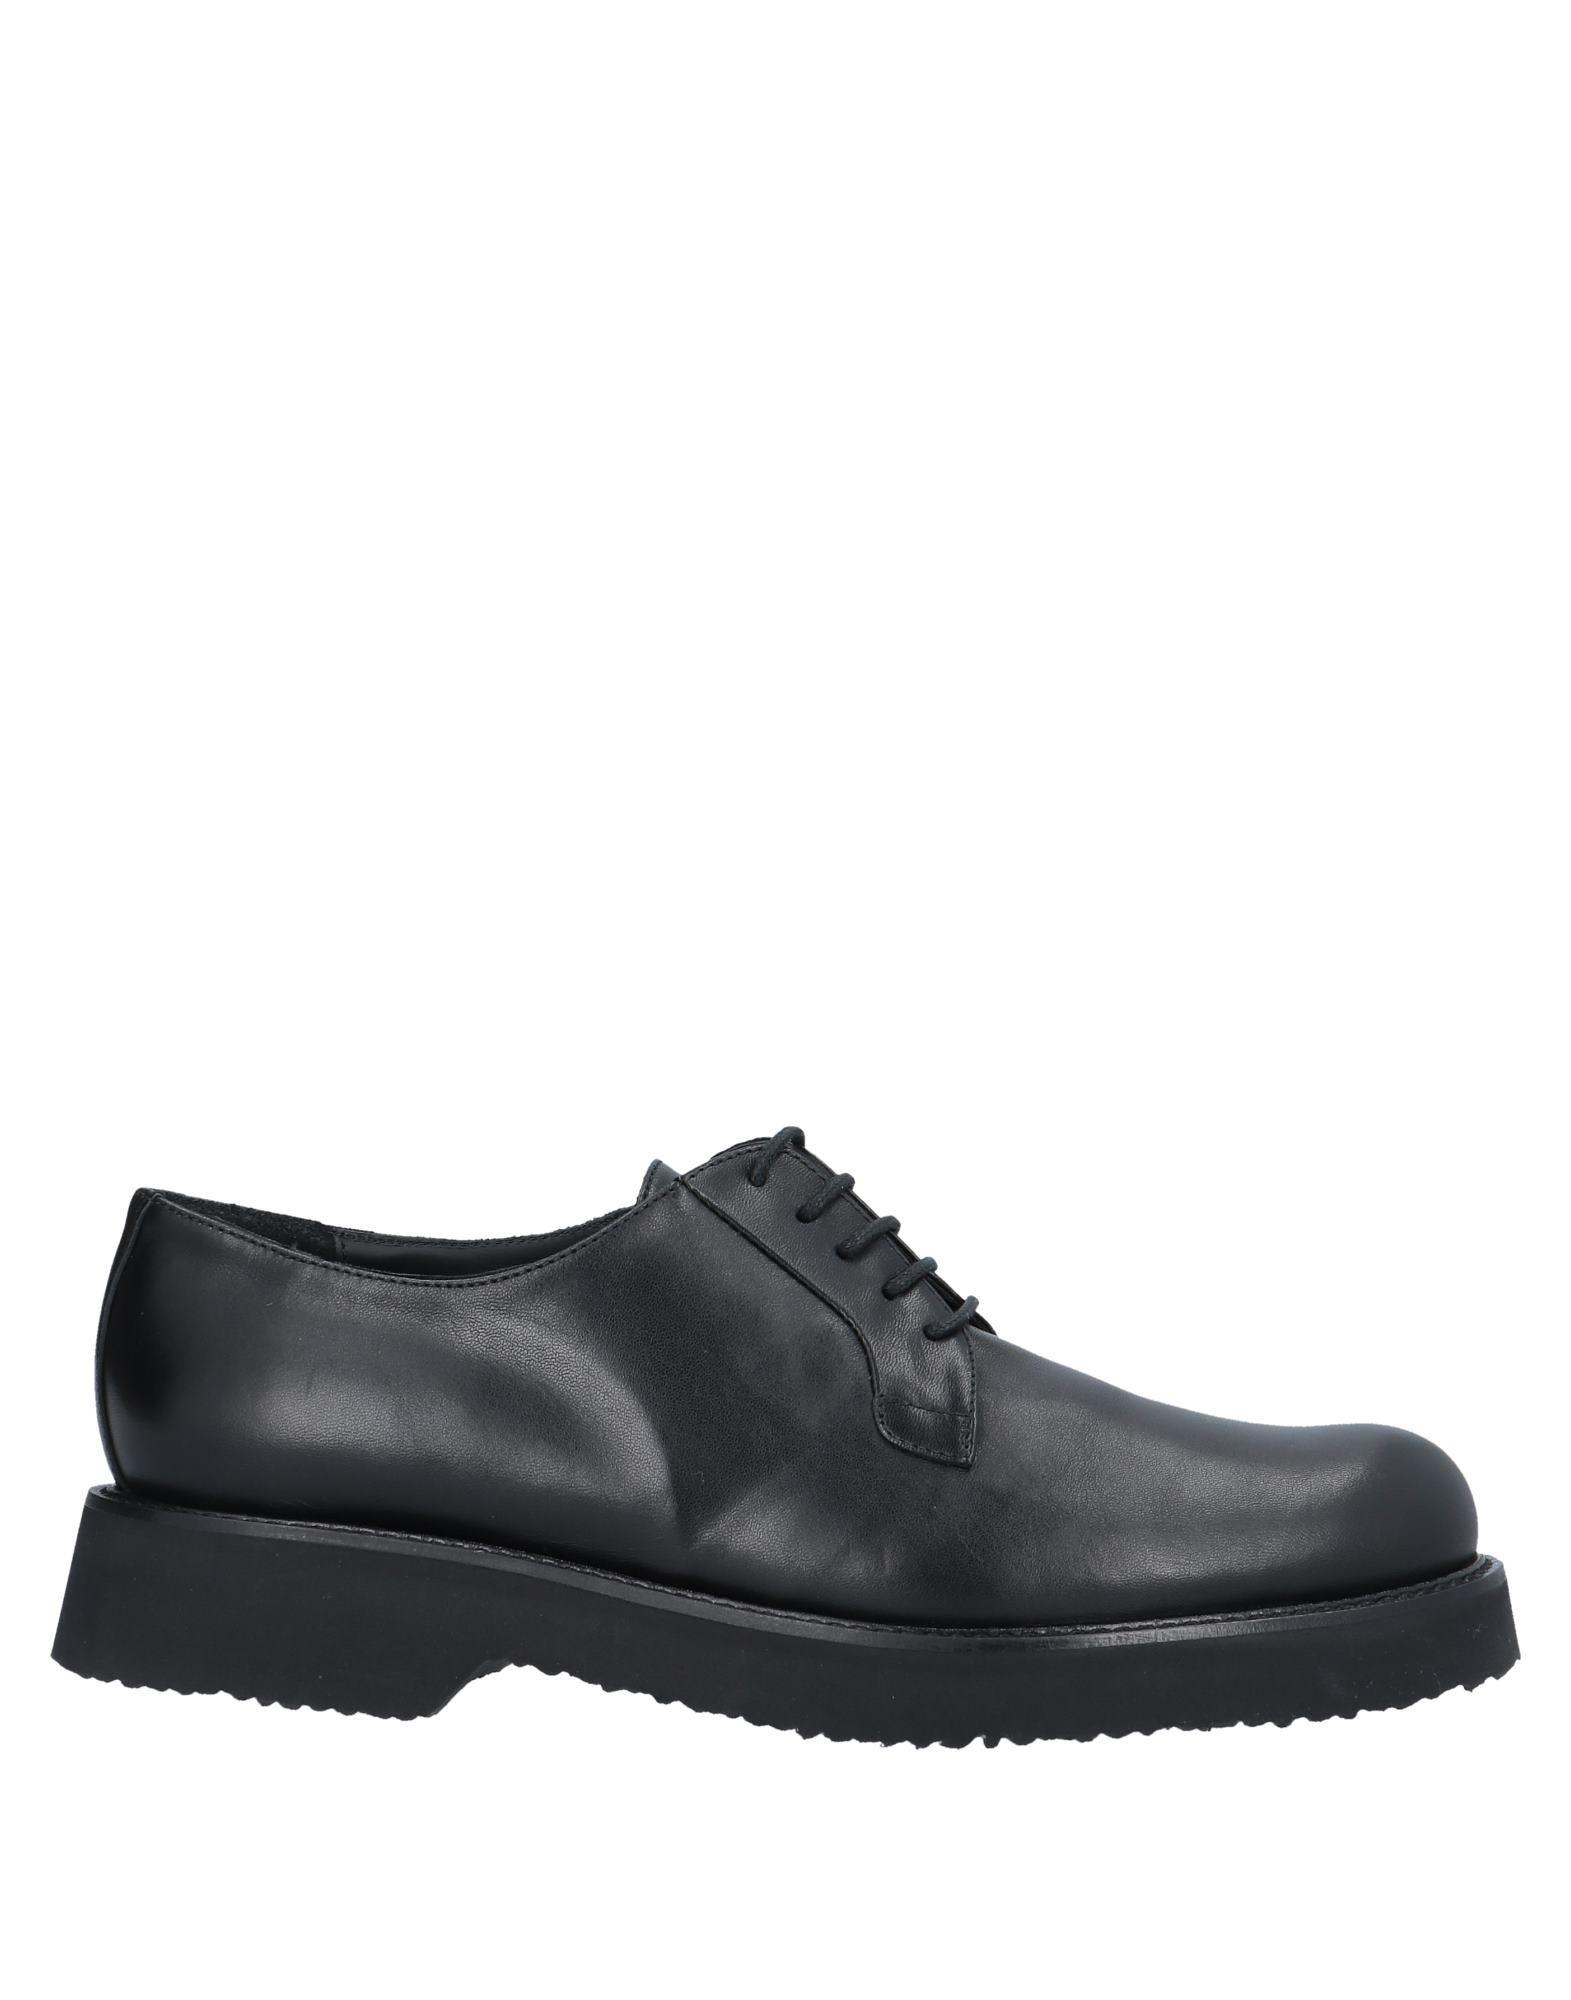 BY A. Обувь на шнурках claudia by isaberi обувь на шнурках